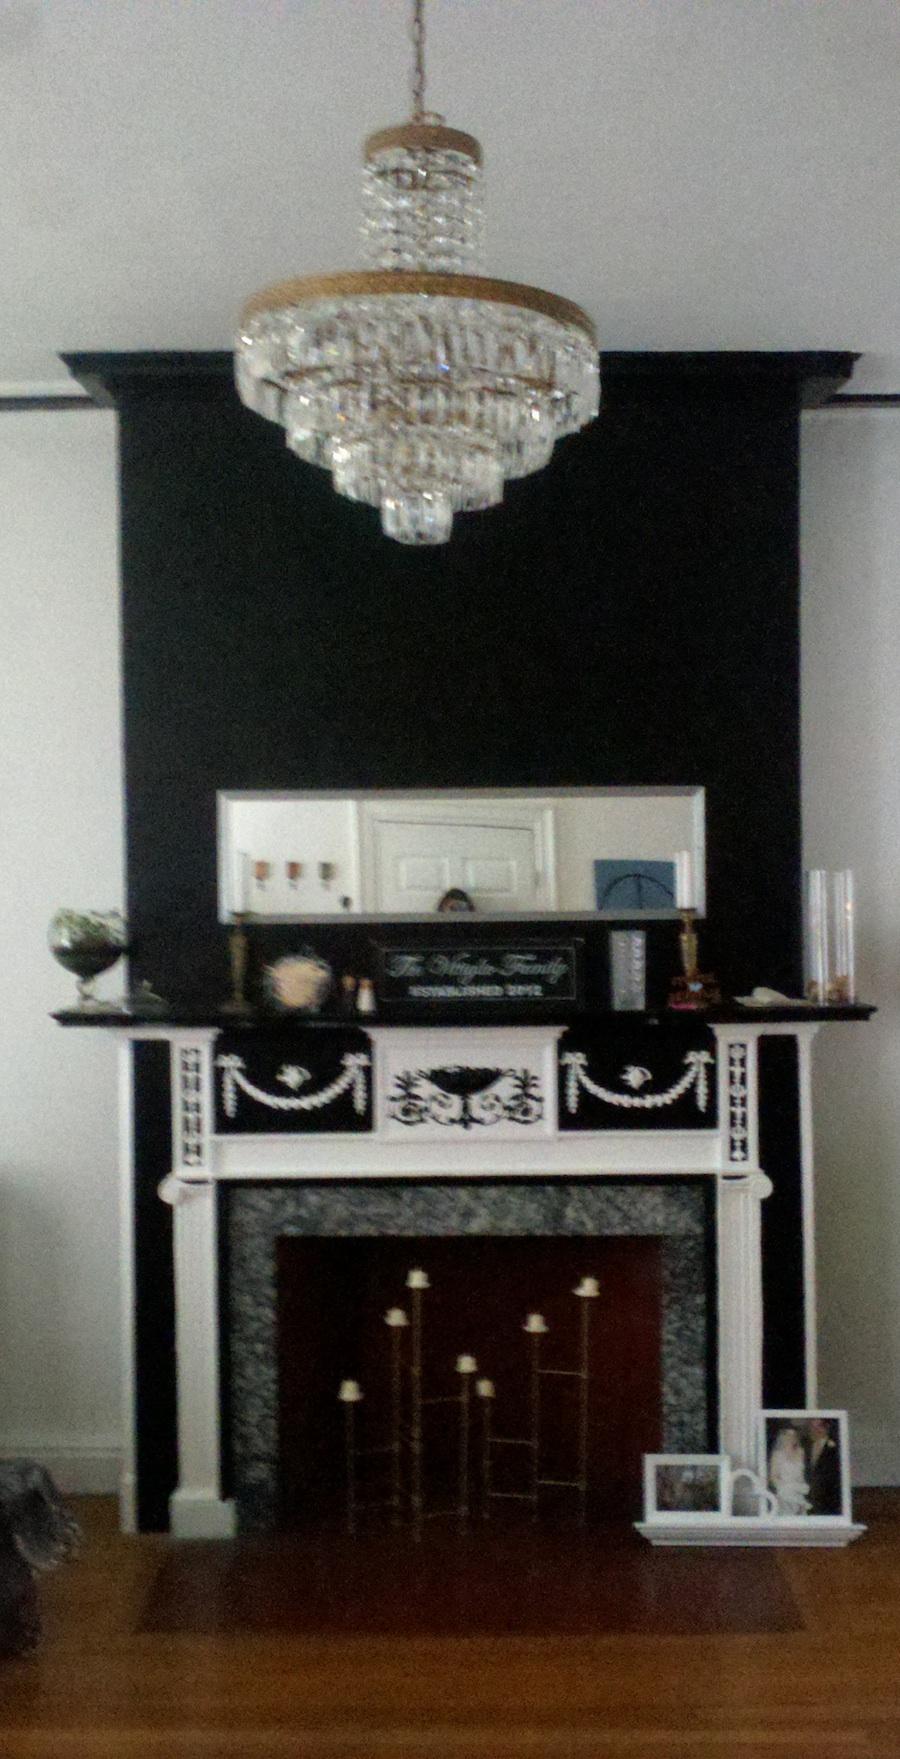 28#3 Fireplace.jpg